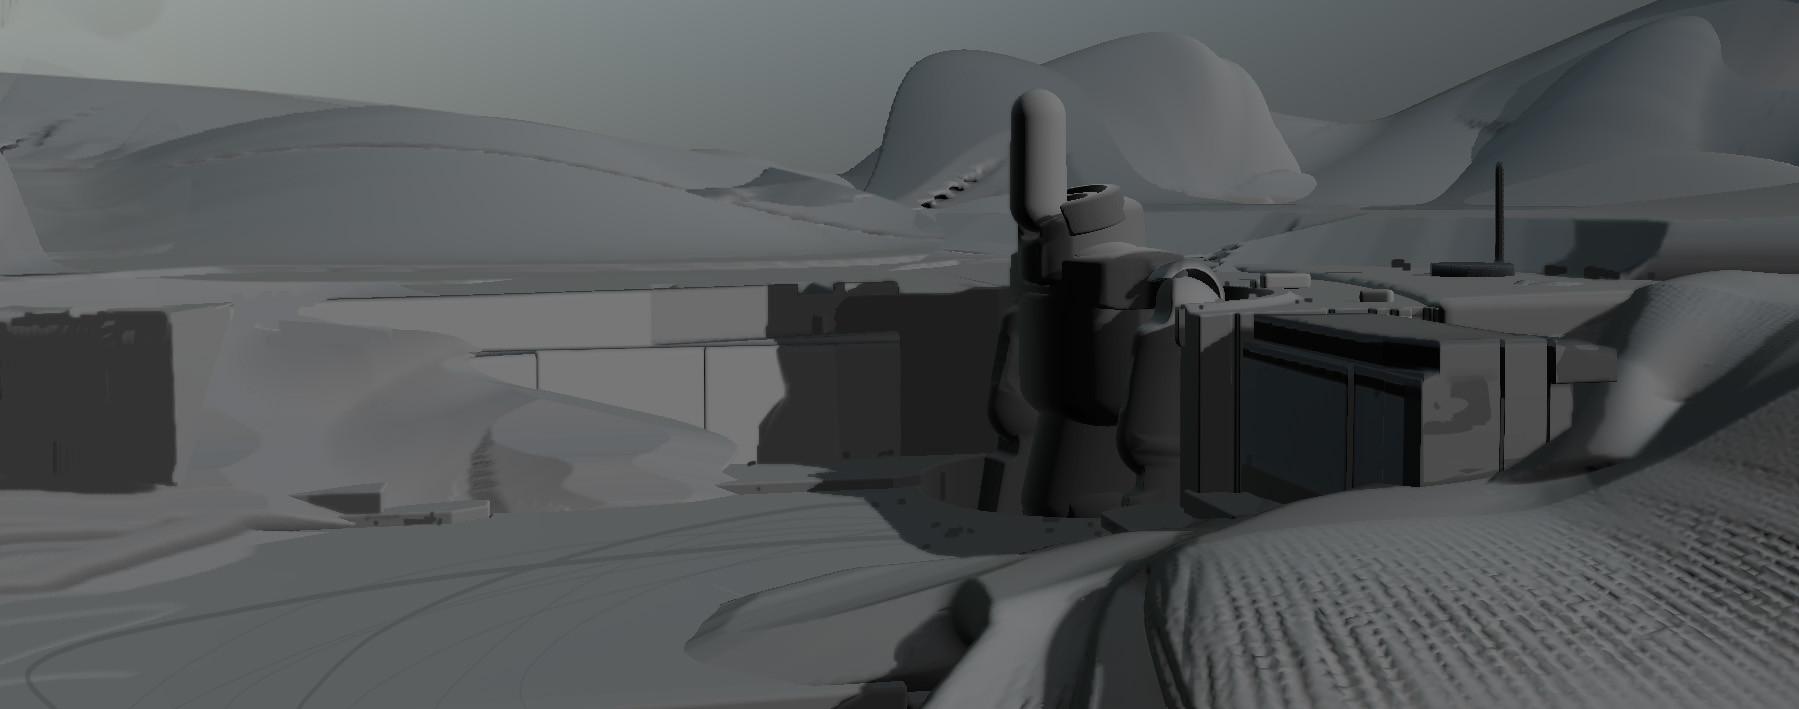 Mikhail rakhmatullin giant bot 1 1